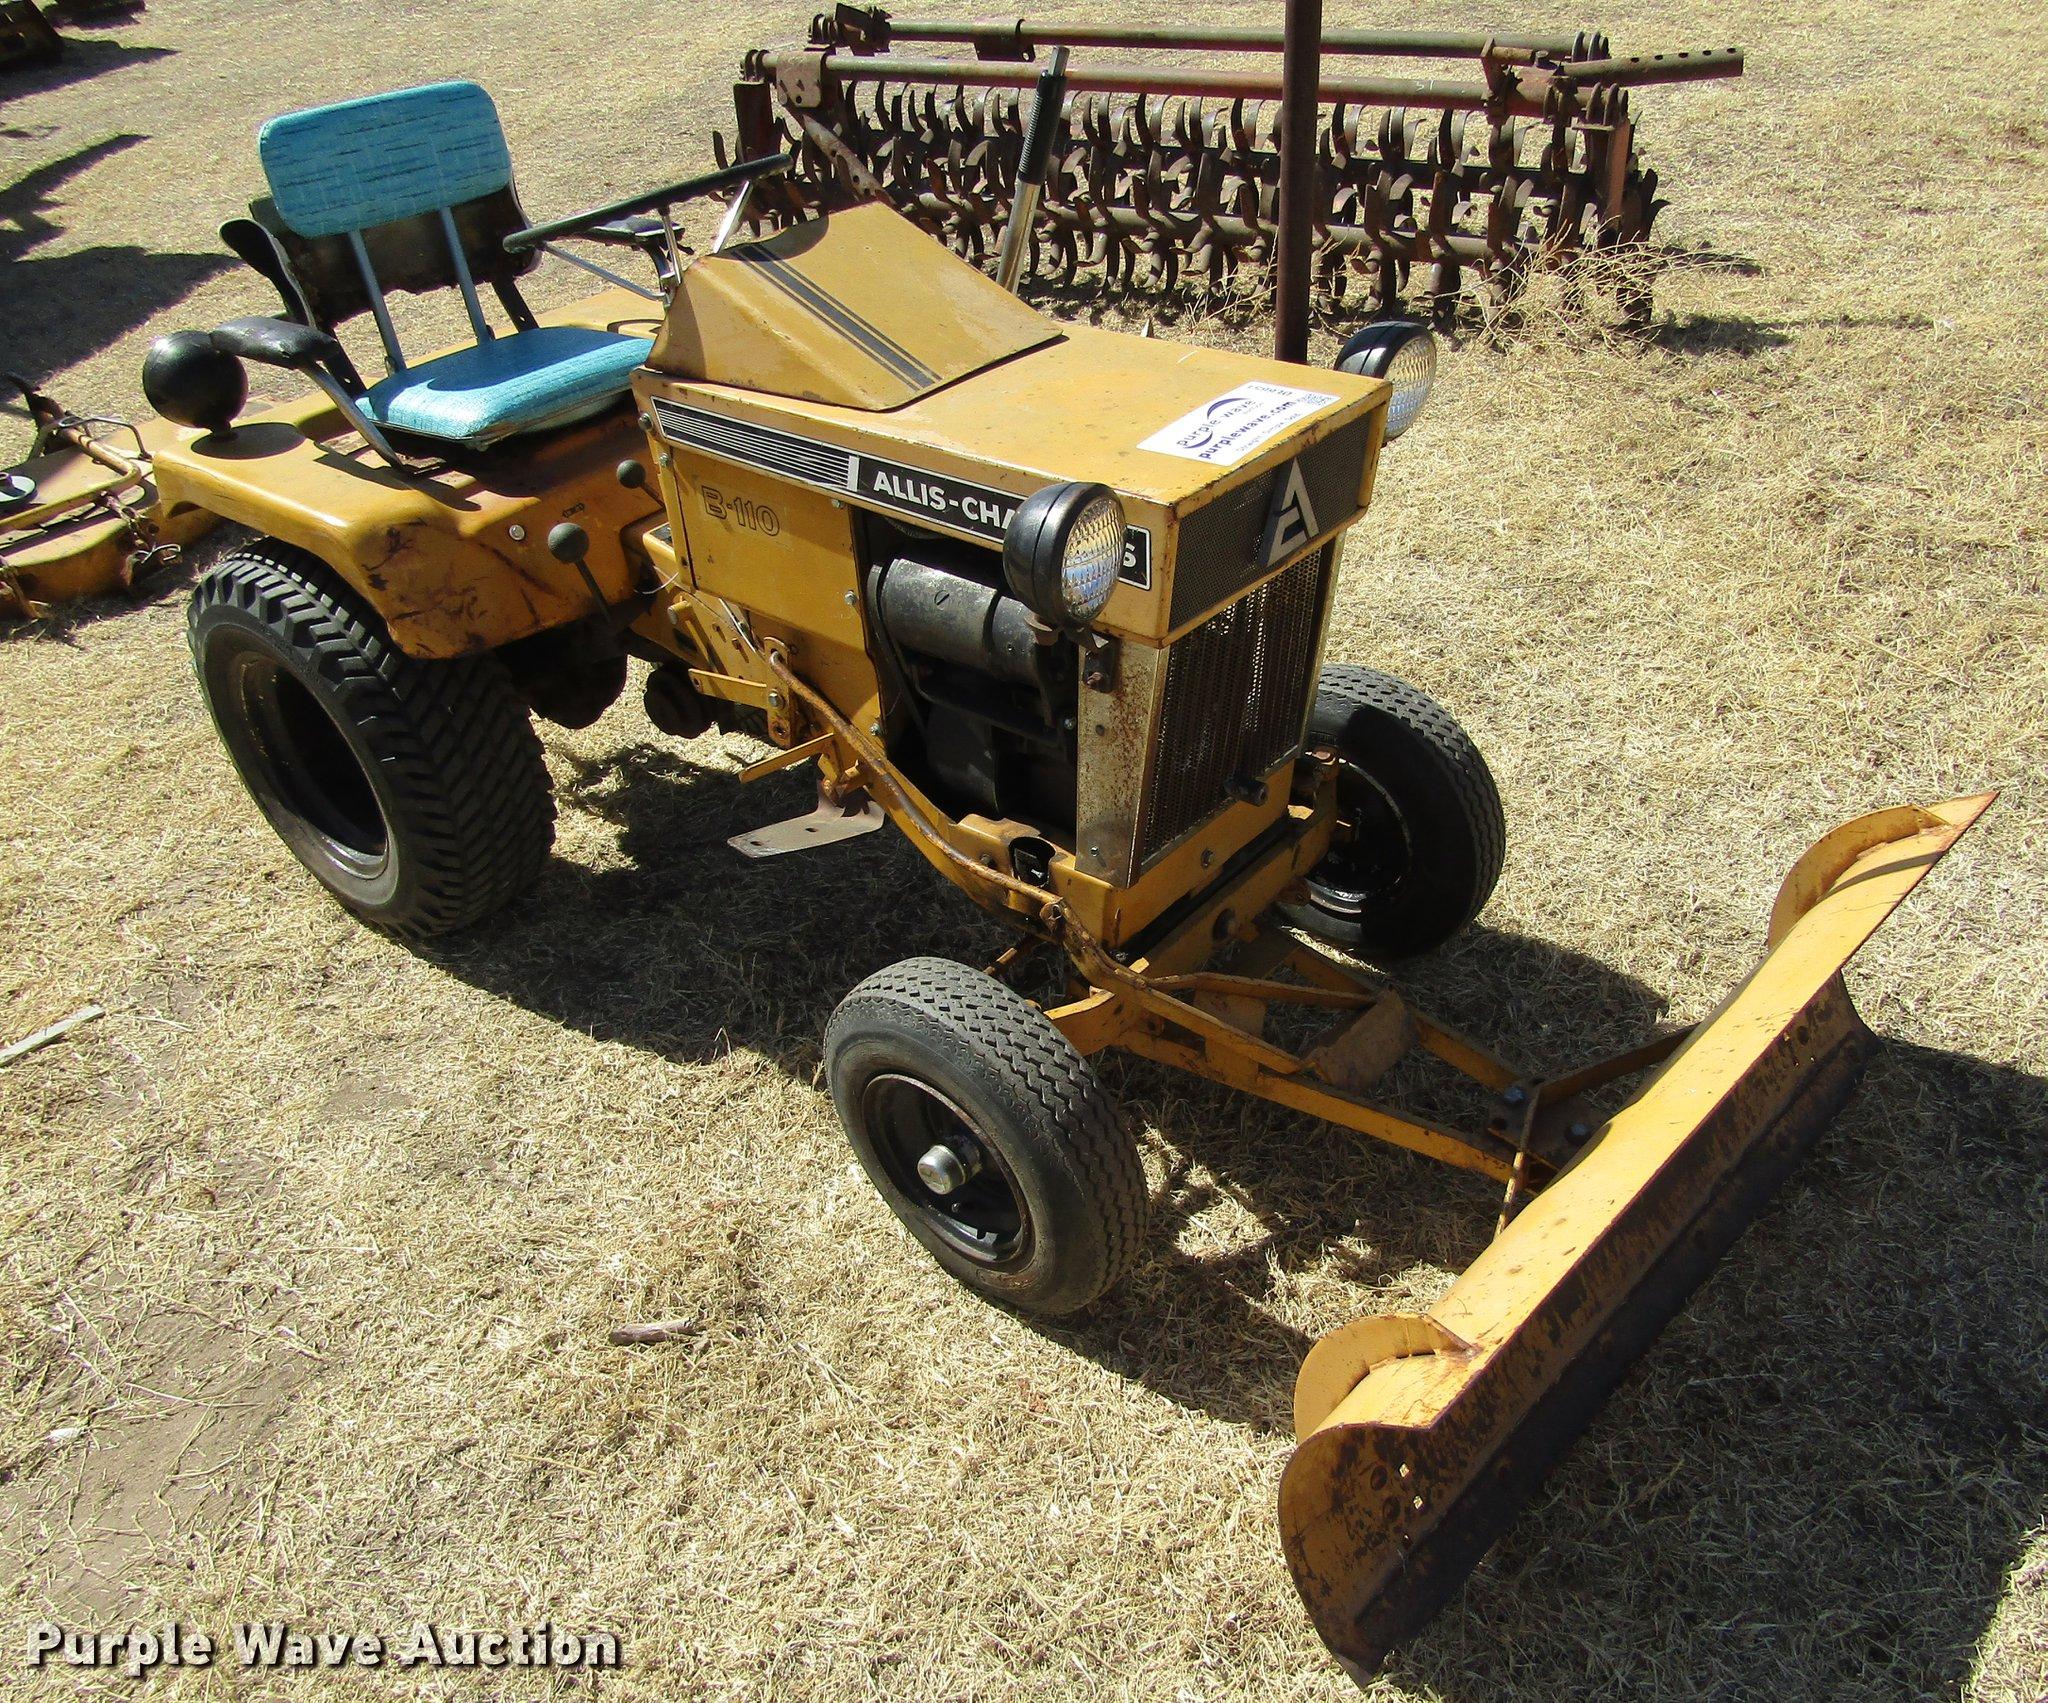 Allis chalmers model b plow